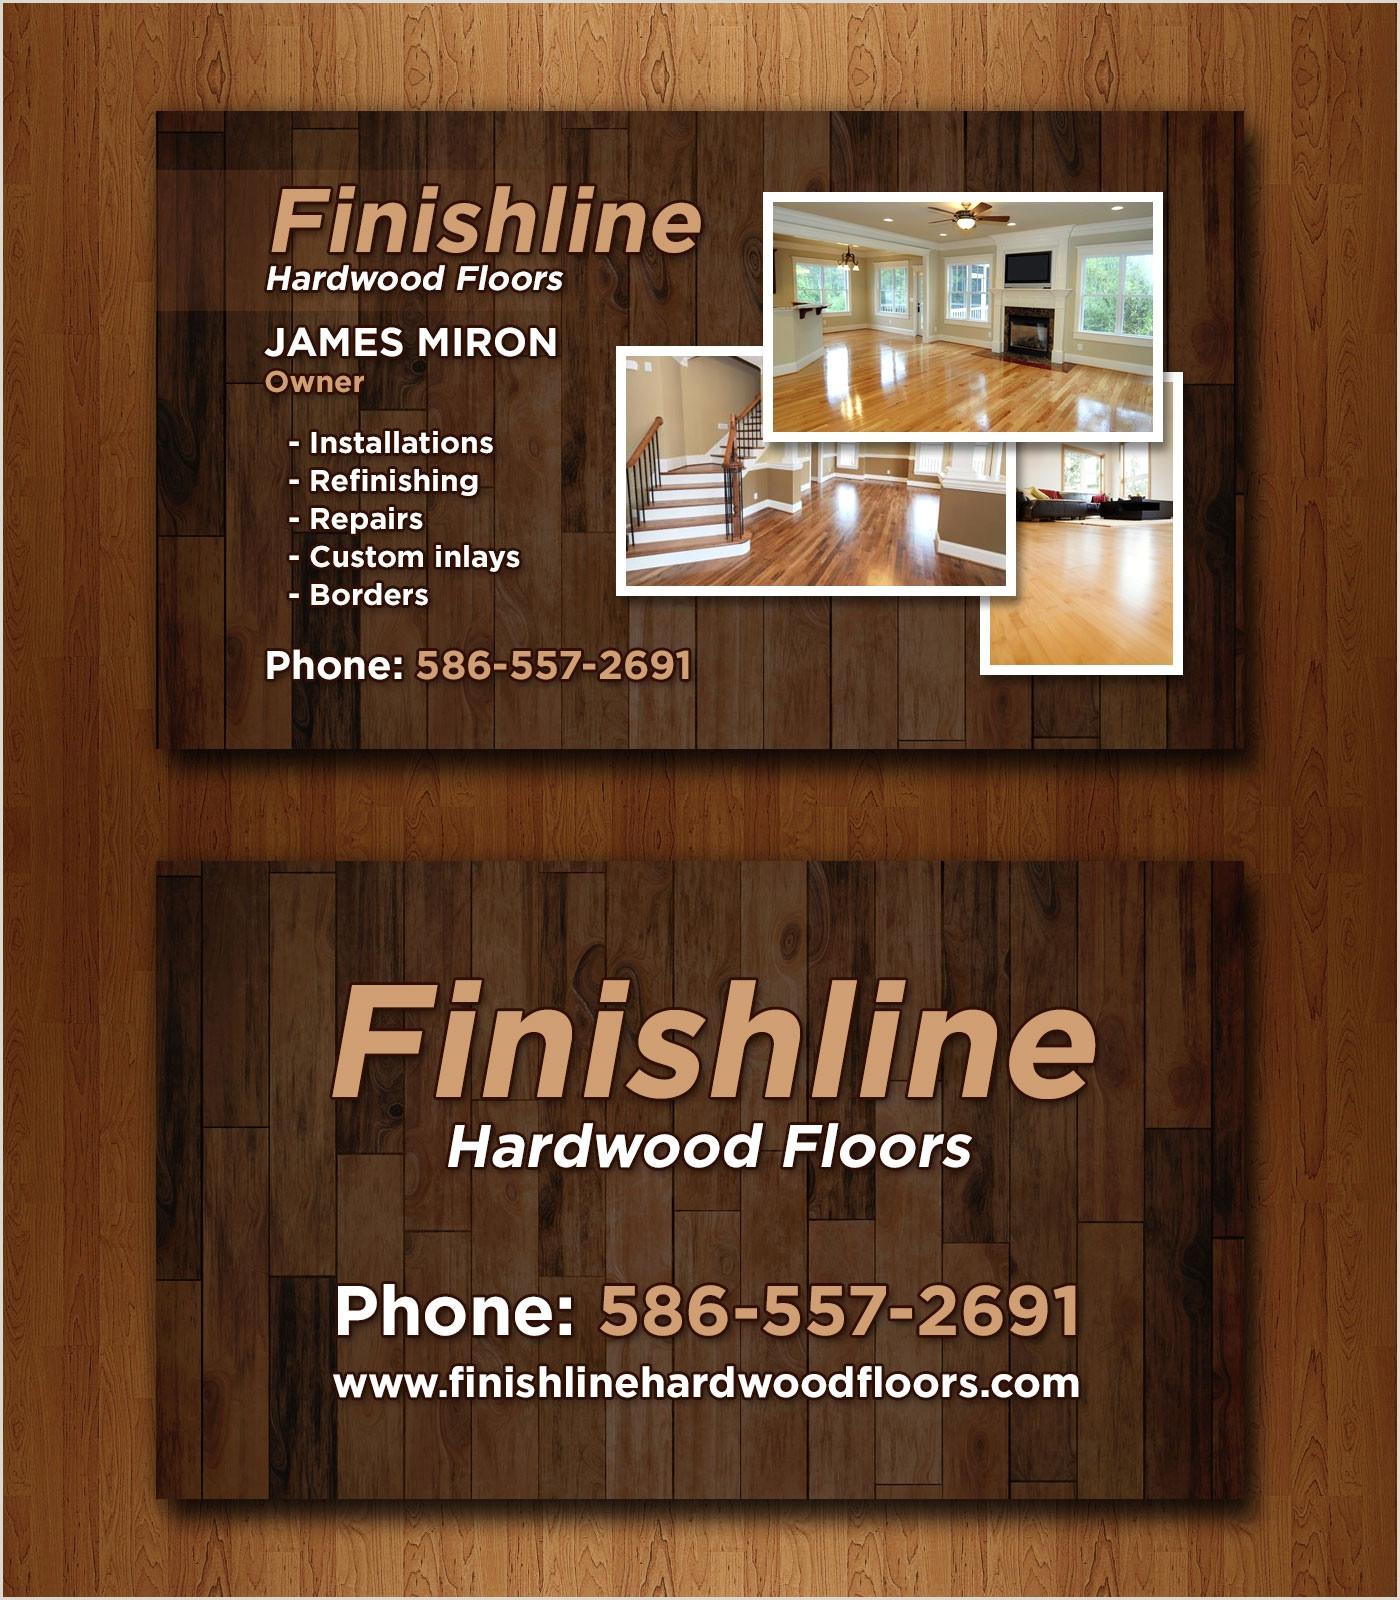 Innovative Business Card Designs 14 Popular Hardwood Flooring Business Card Template